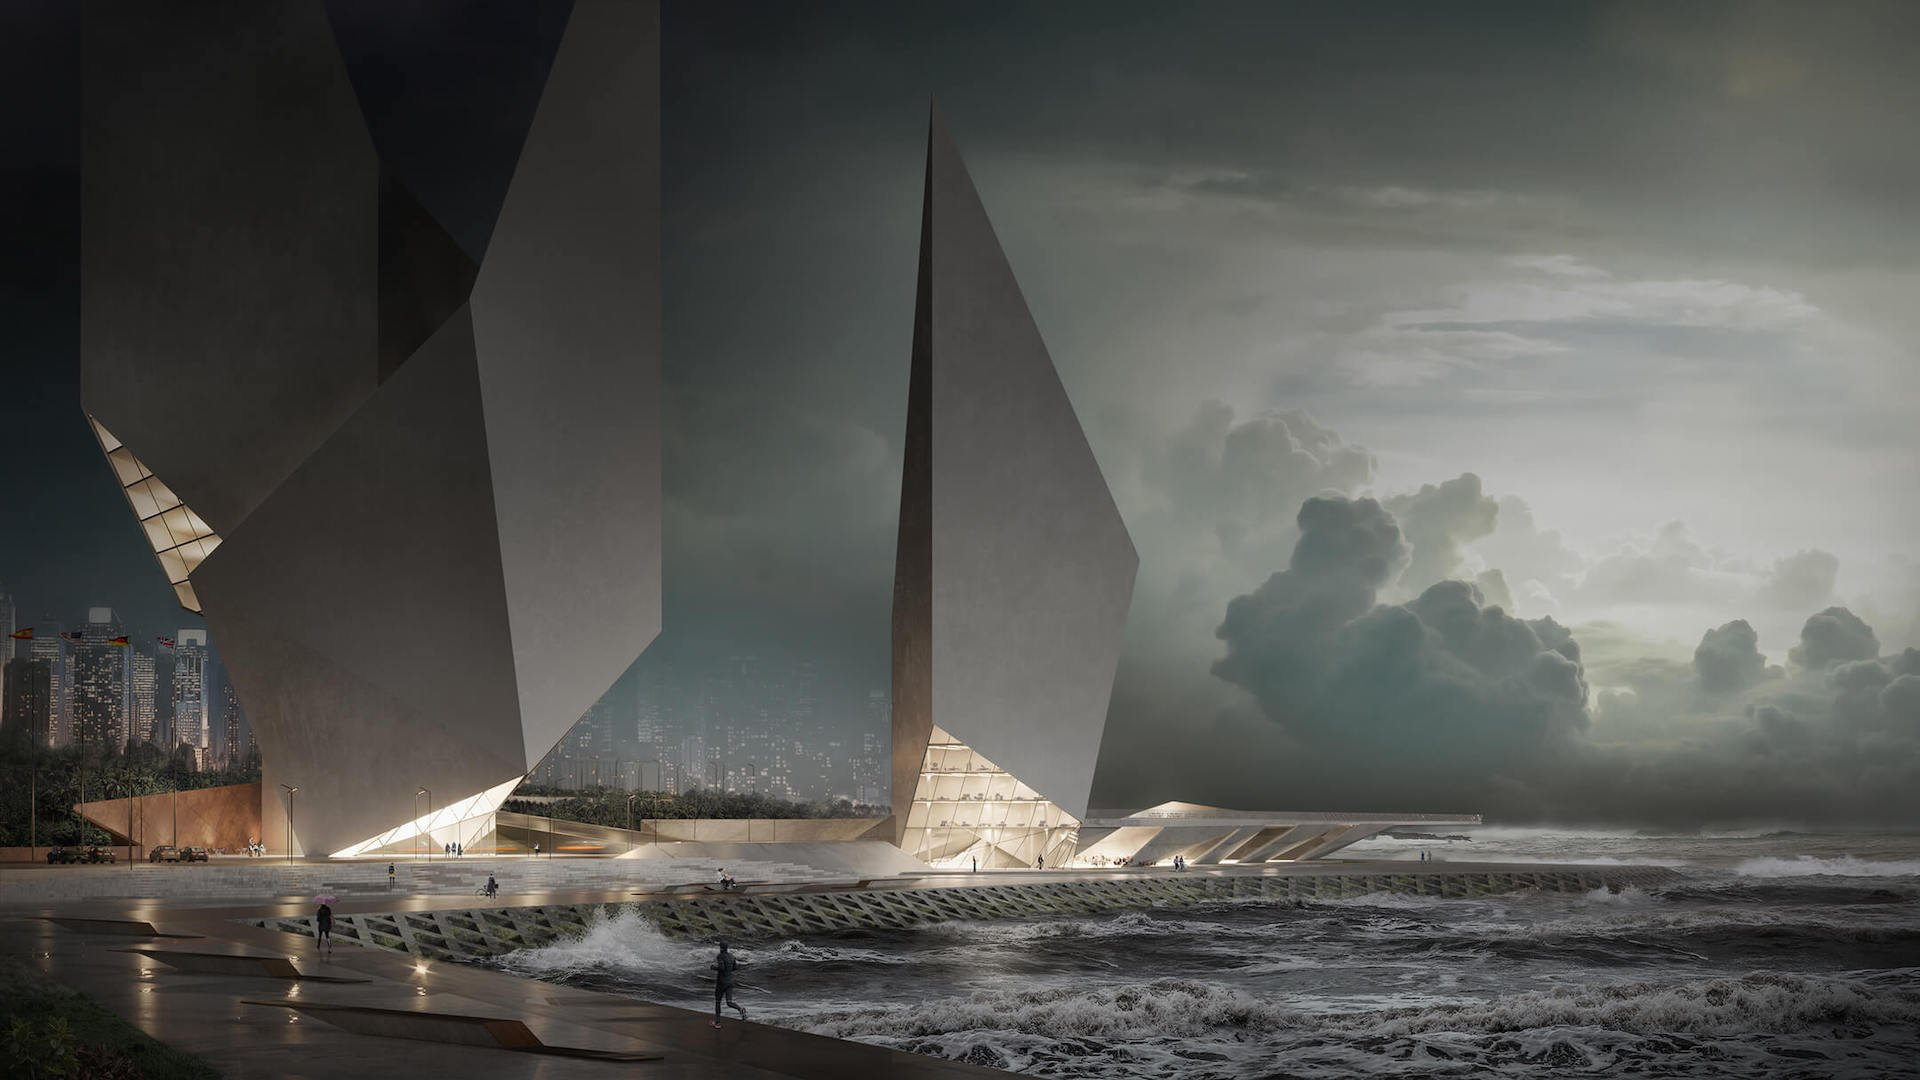 High-Quality Architectural CGI for a Futuristic Hotel Complex